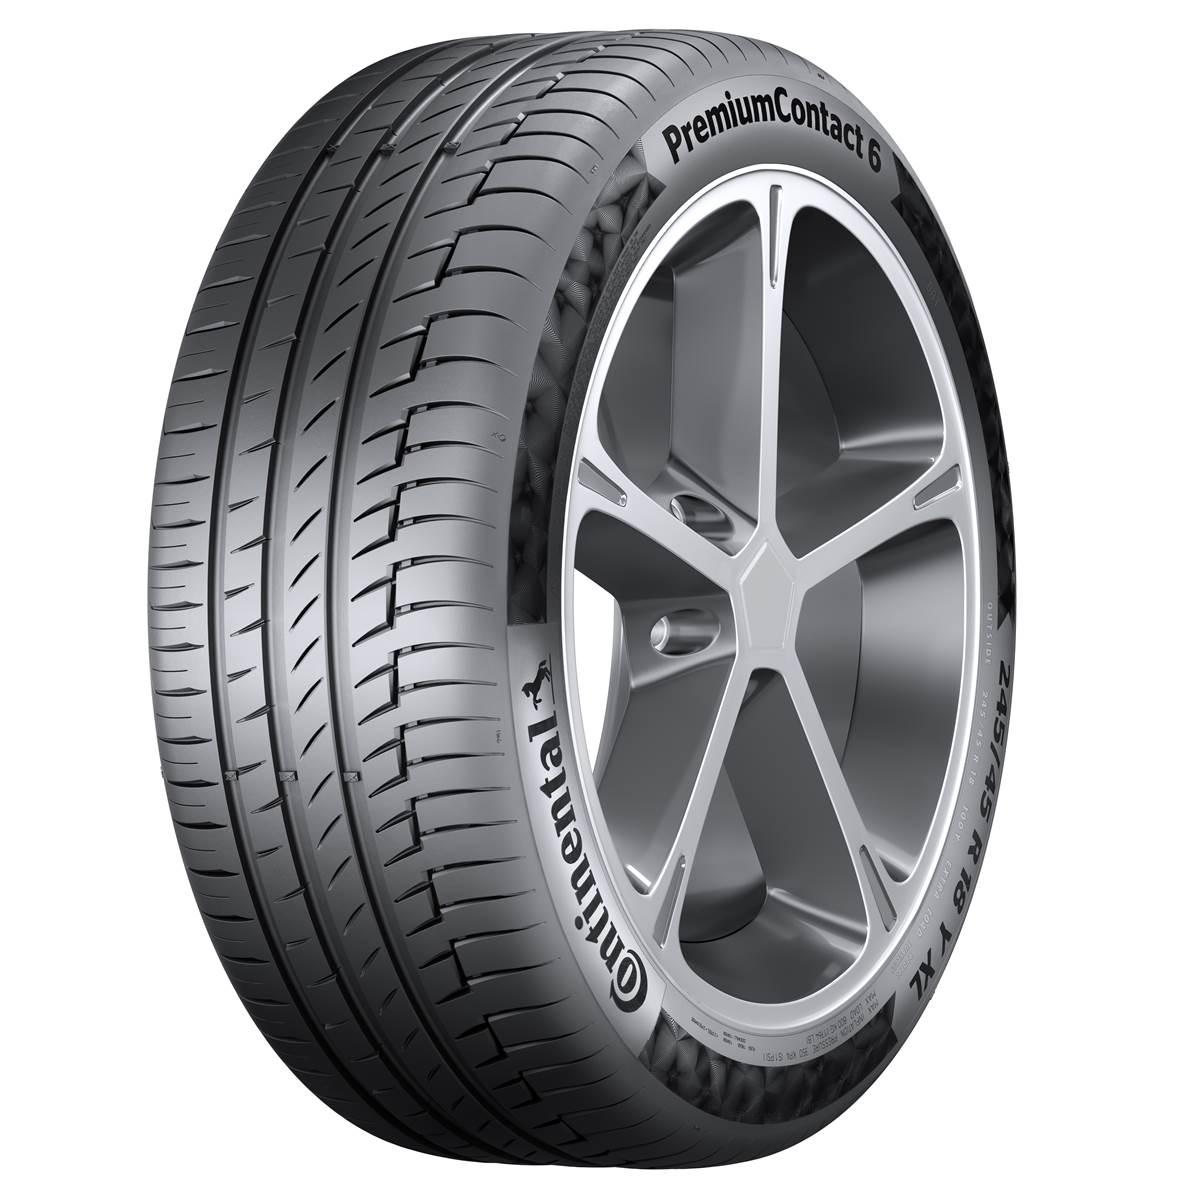 Pneu Continental Premium Contact 6 - 245/40R19 98 Y